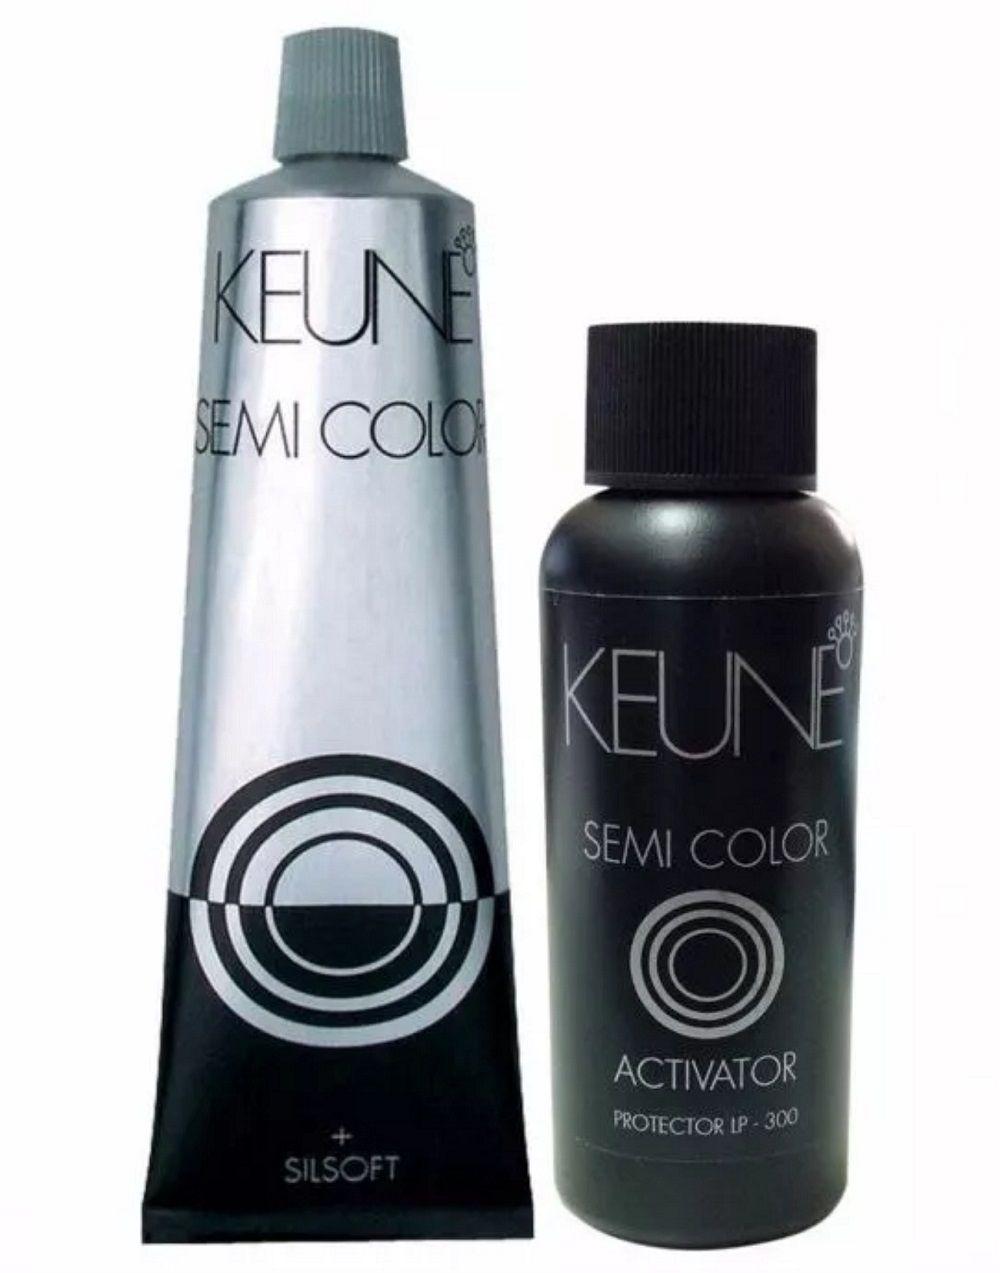 Kit Keune Tonalizante 60ml - Cor 5 - Castanho Claro + Ativador 60ml